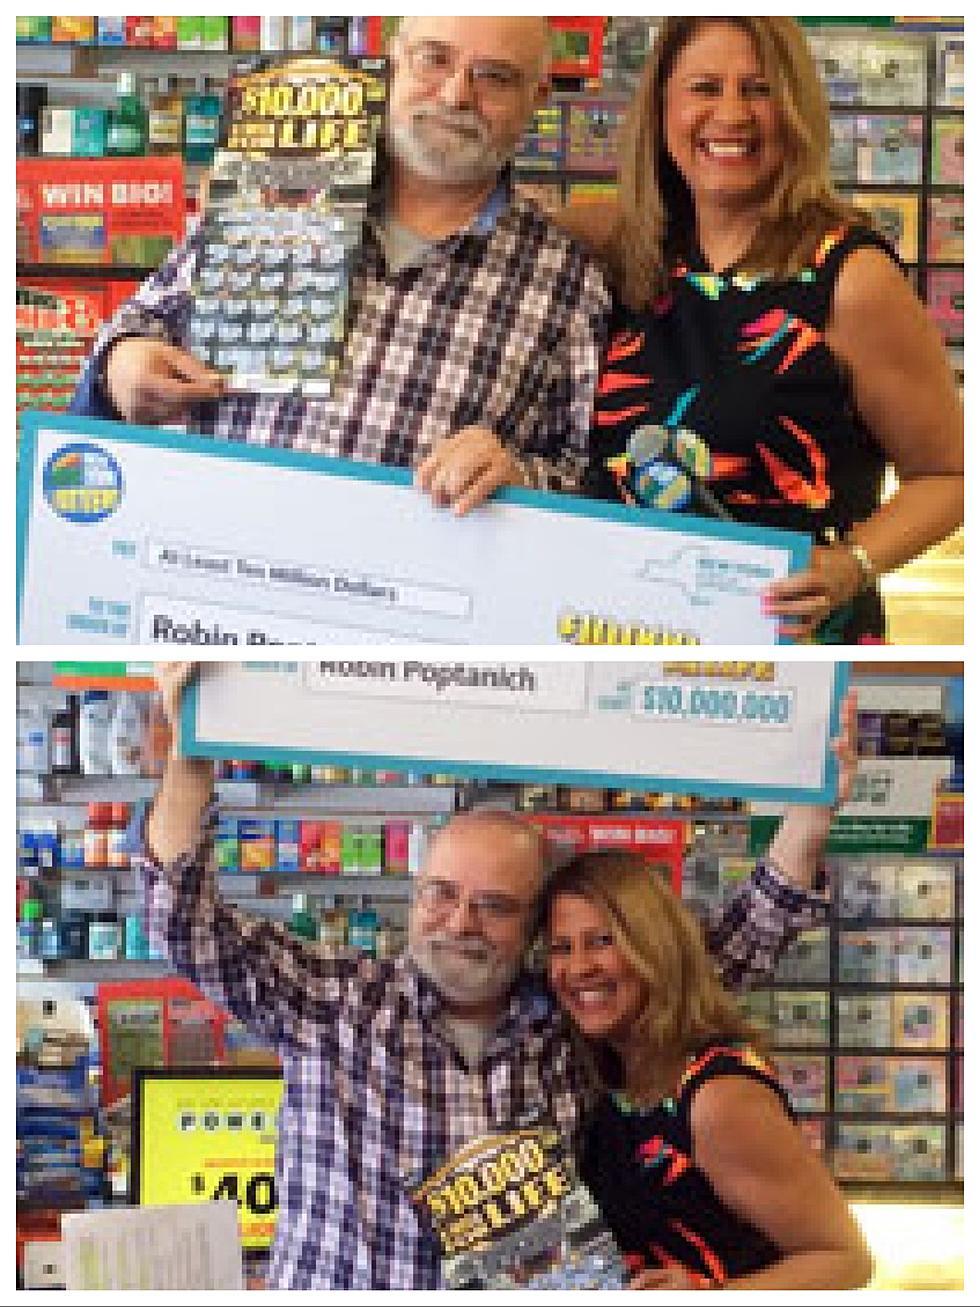 NY man wins $10,000 a week for life